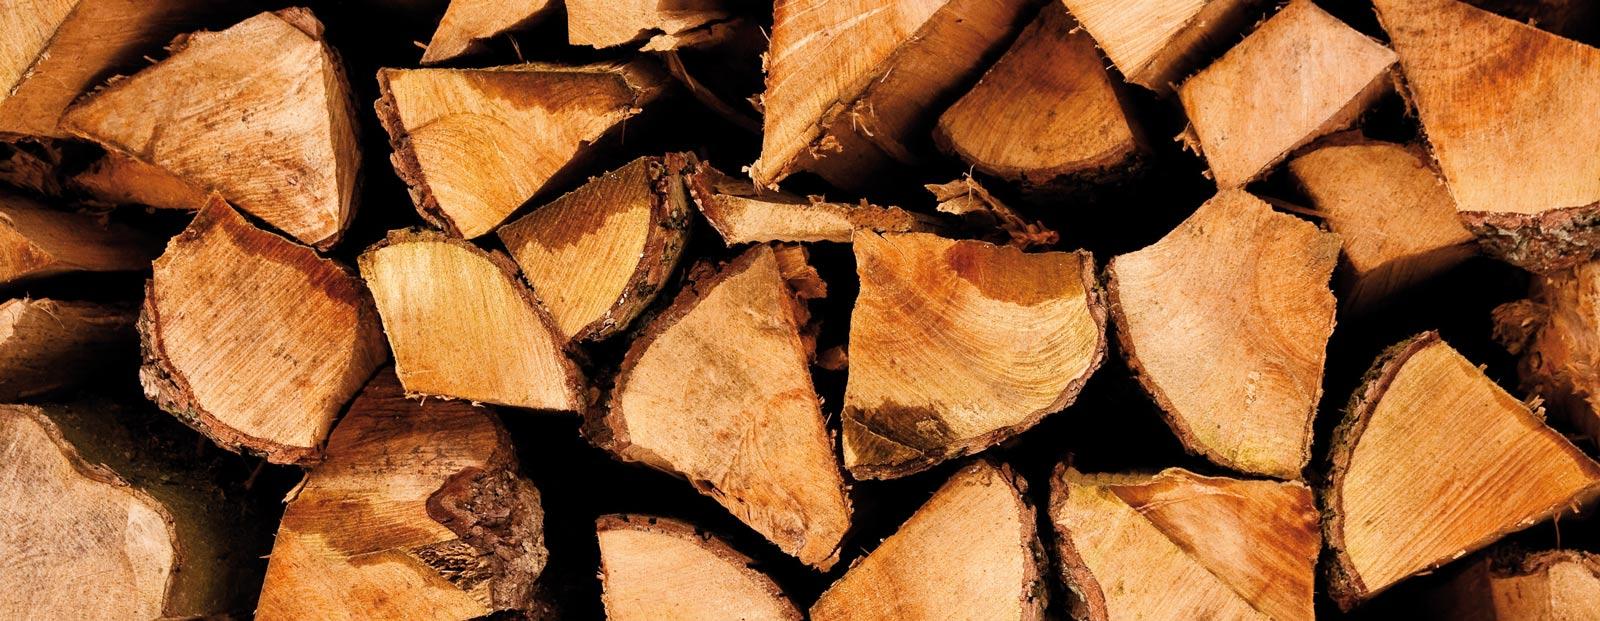 Heizen mit Holz / Pellets